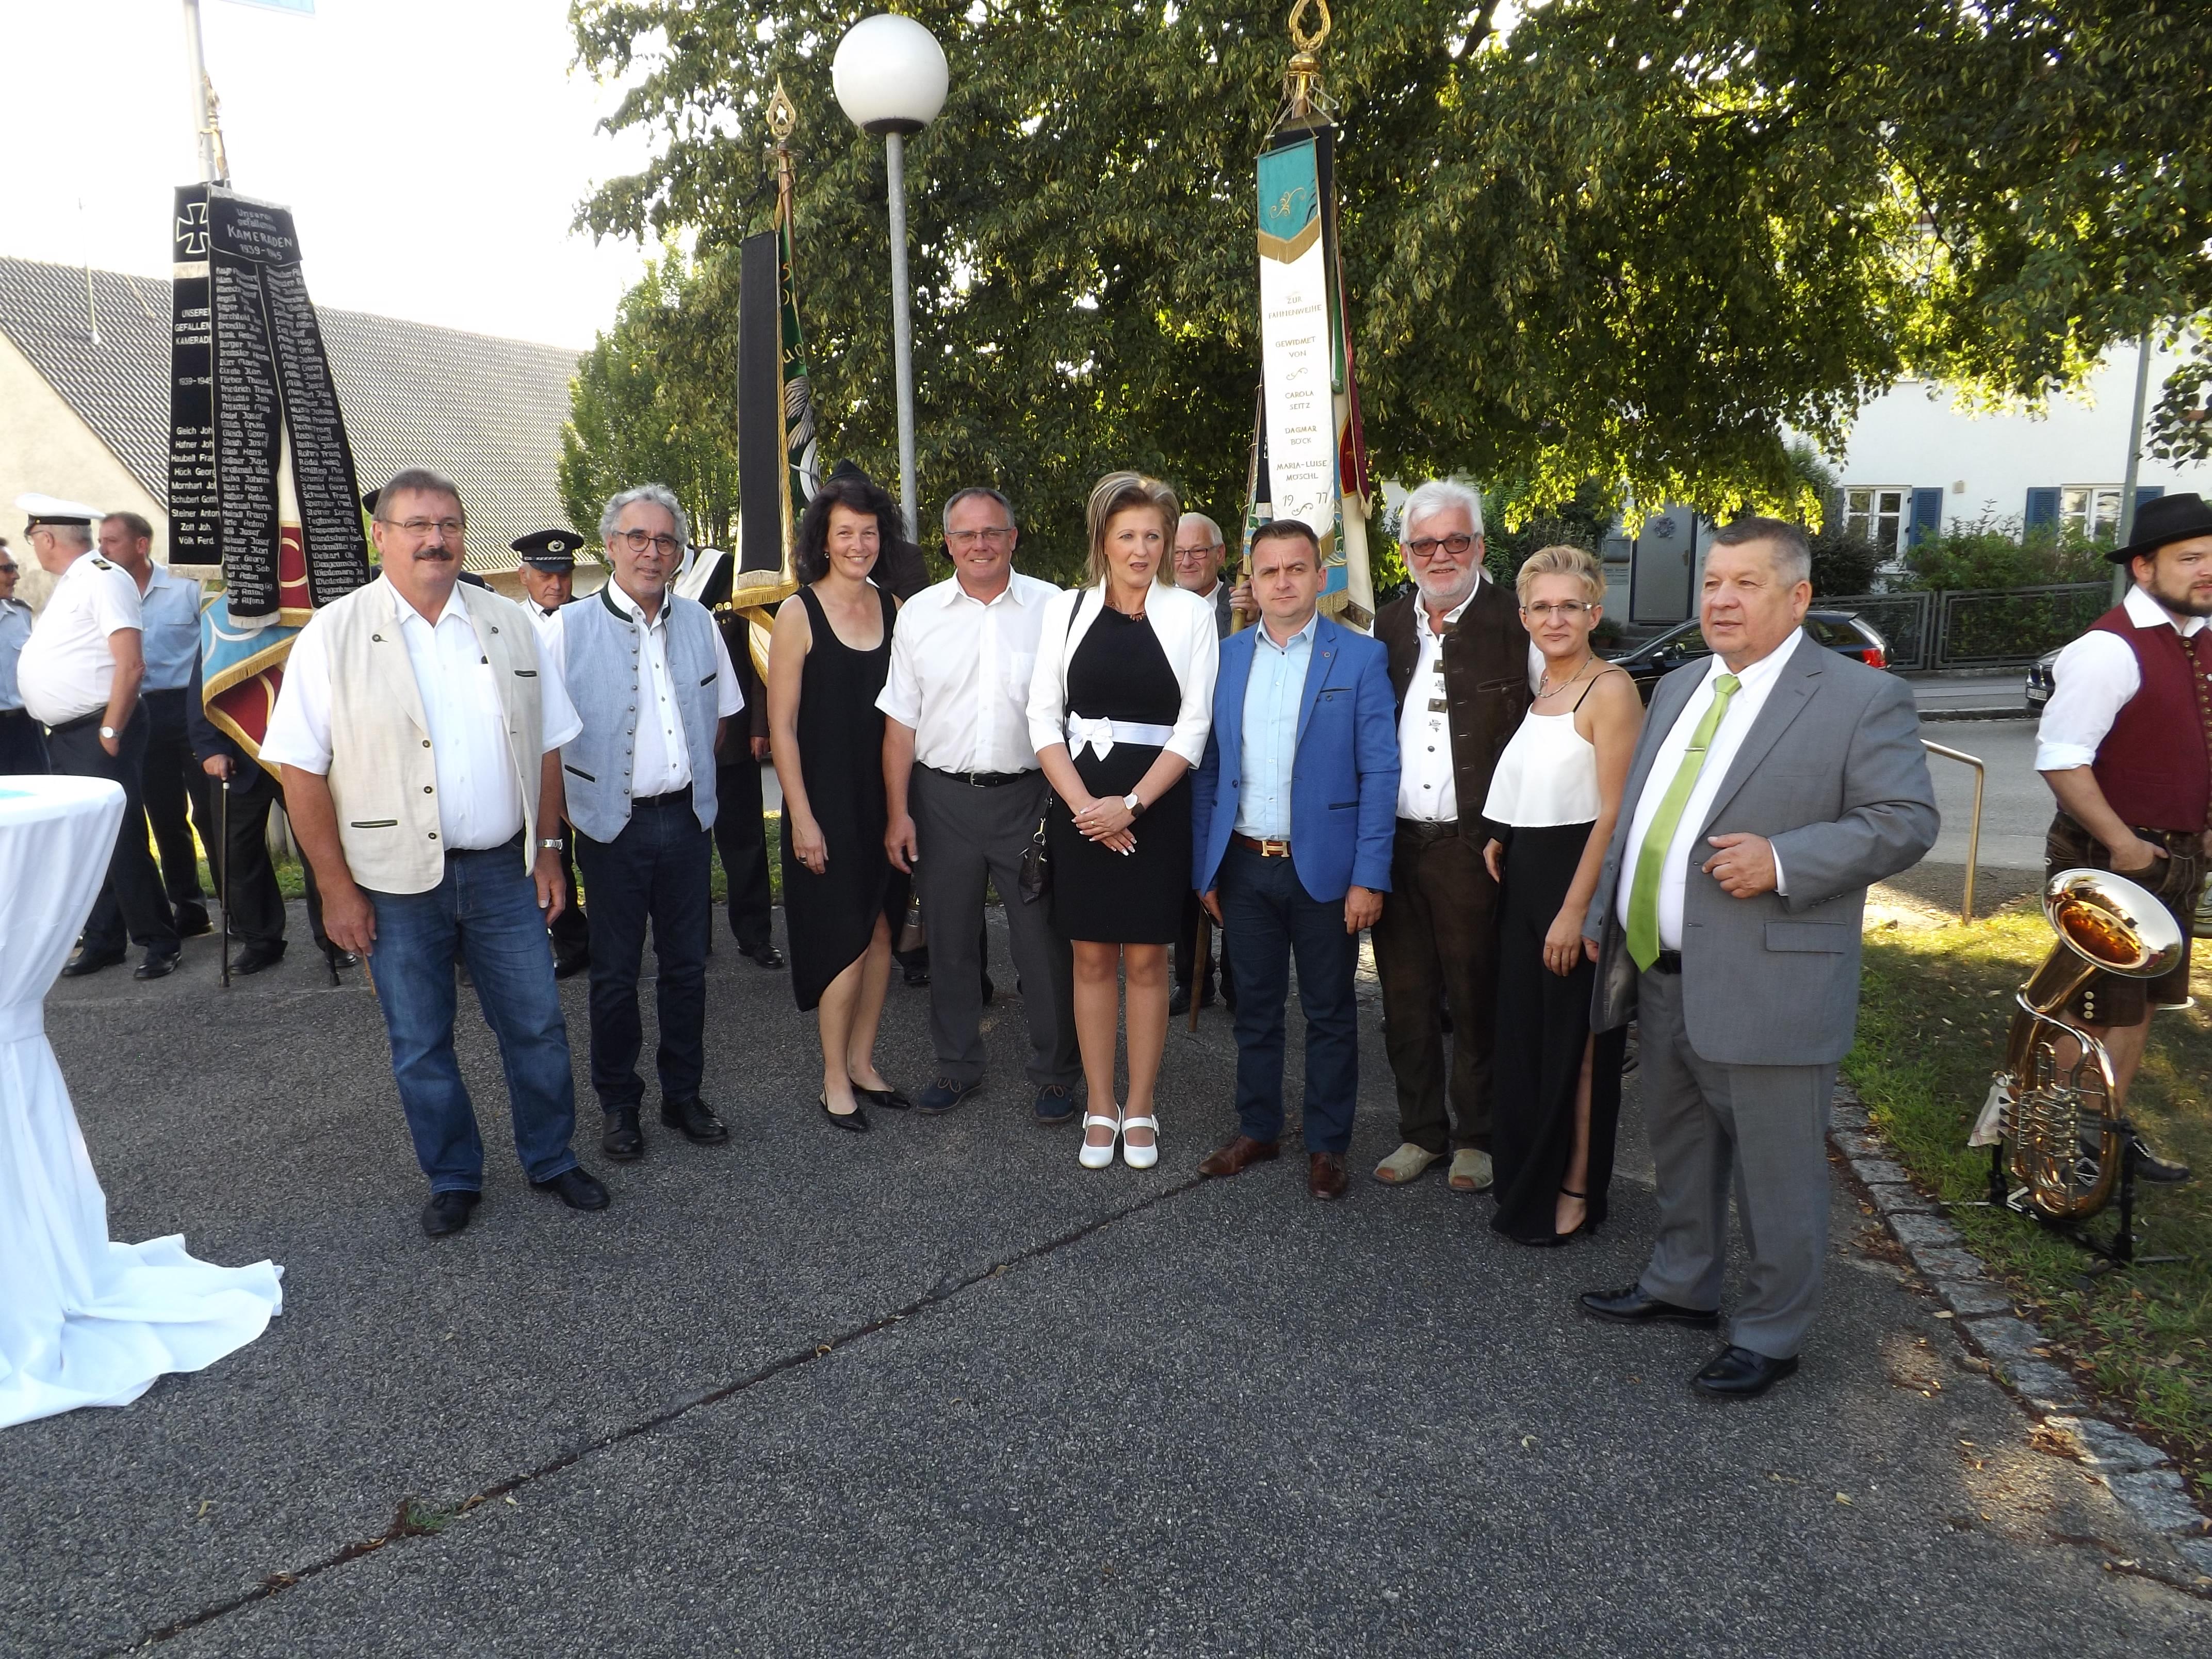 Festakt zum 20jährigen Bestehen der Partnerschaft in Dinkelscherben